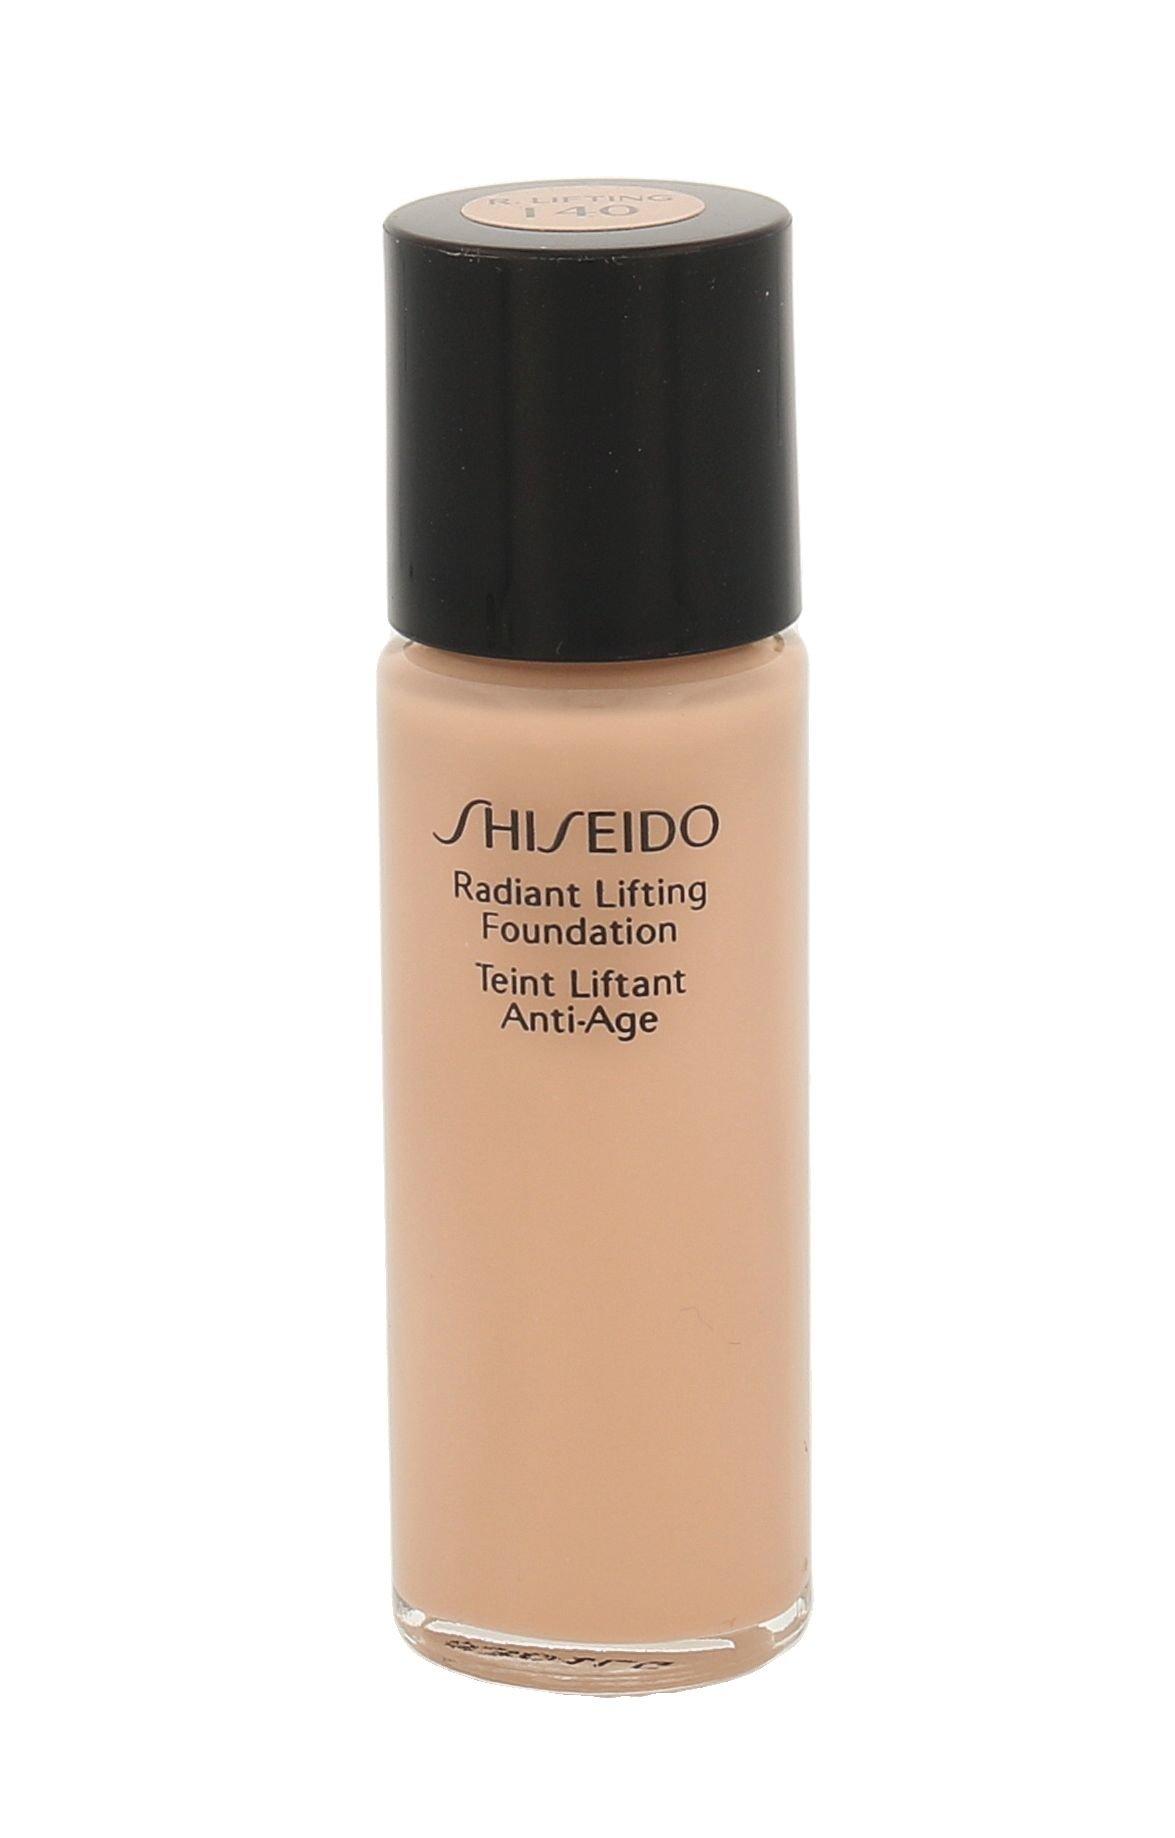 Shiseido Radiant Lifting Foundation Cosmetic 15ml I40 Natural Fair Ivory